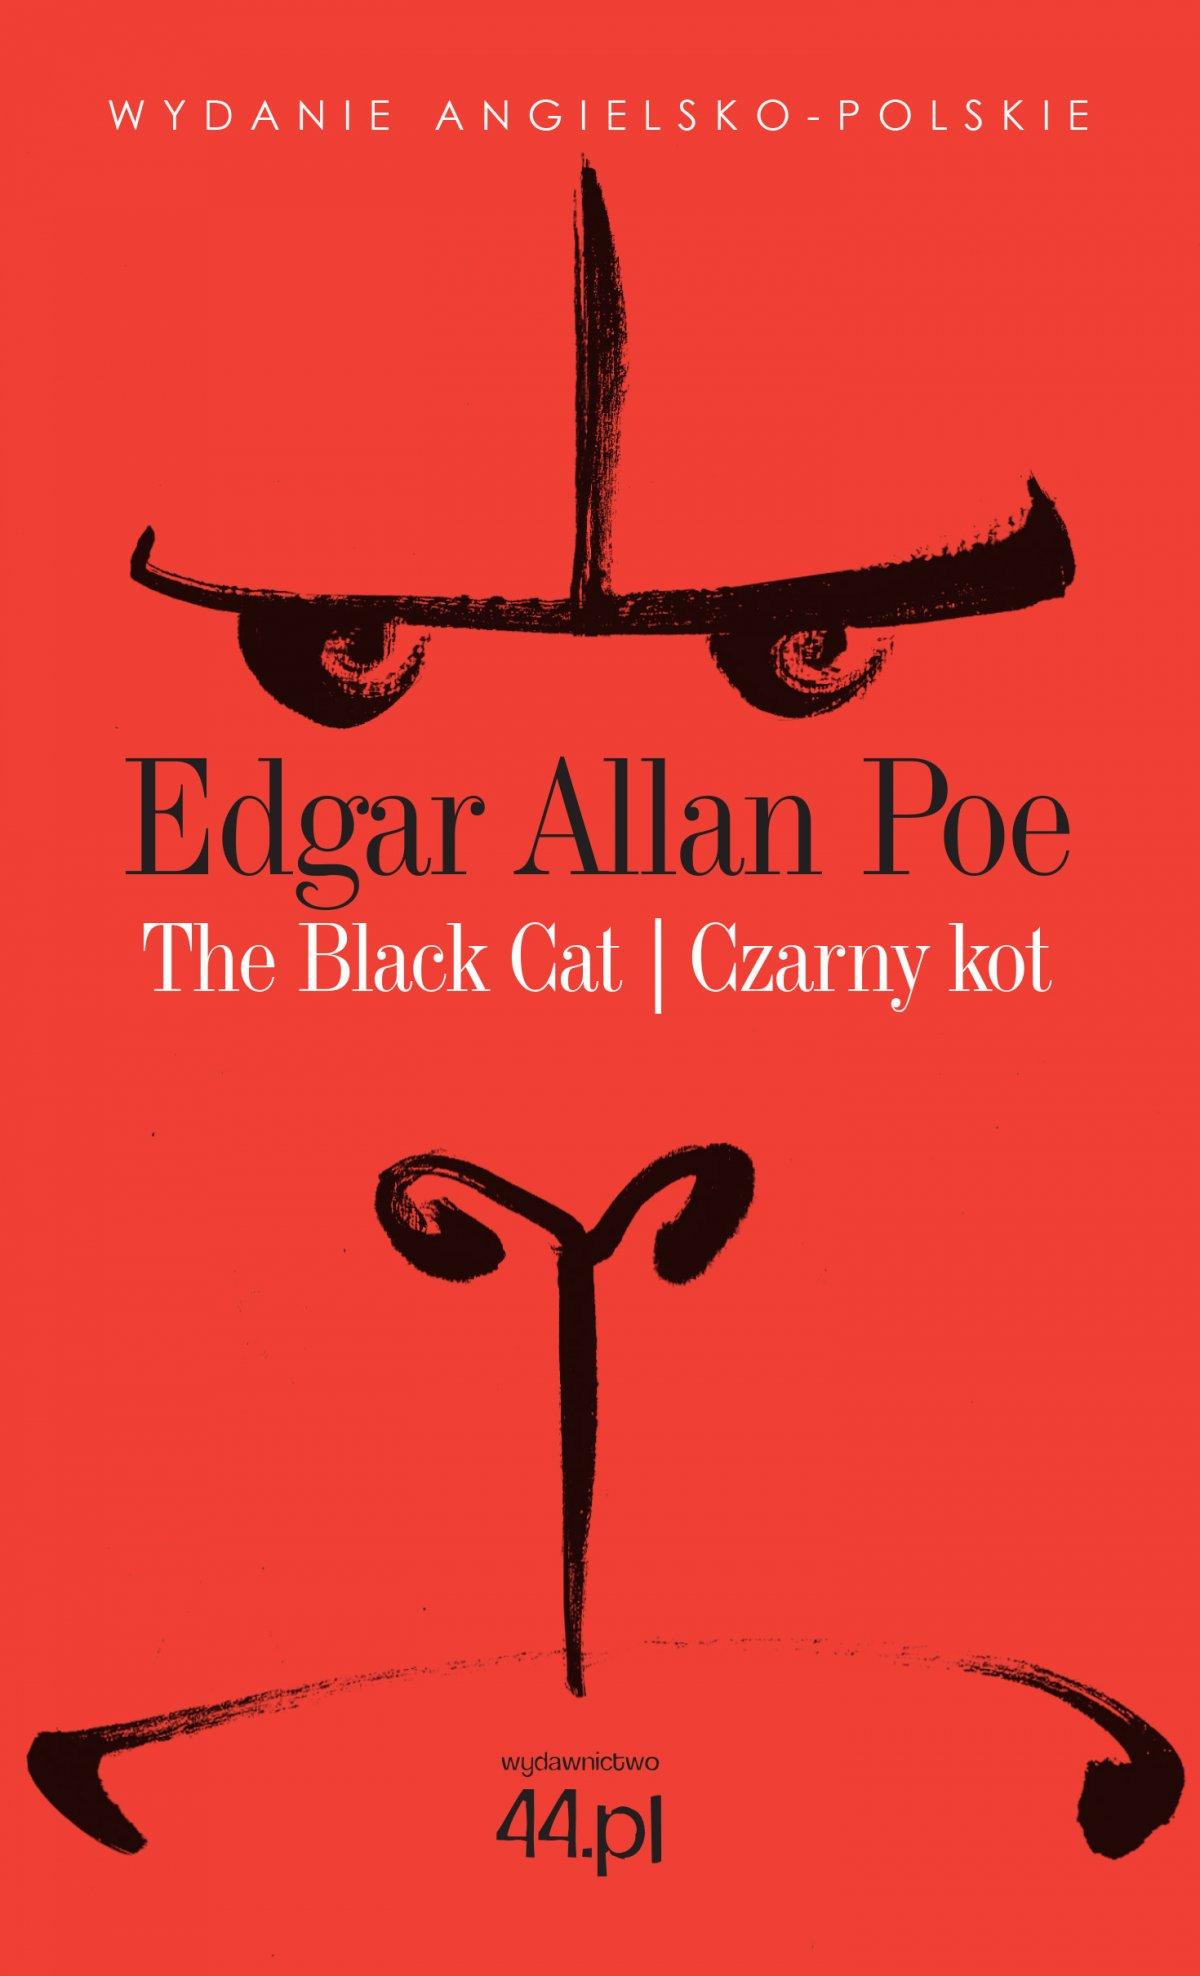 The Black Cat. Czarny Kot - Ebook (Książka na Kindle) do pobrania w formacie MOBI